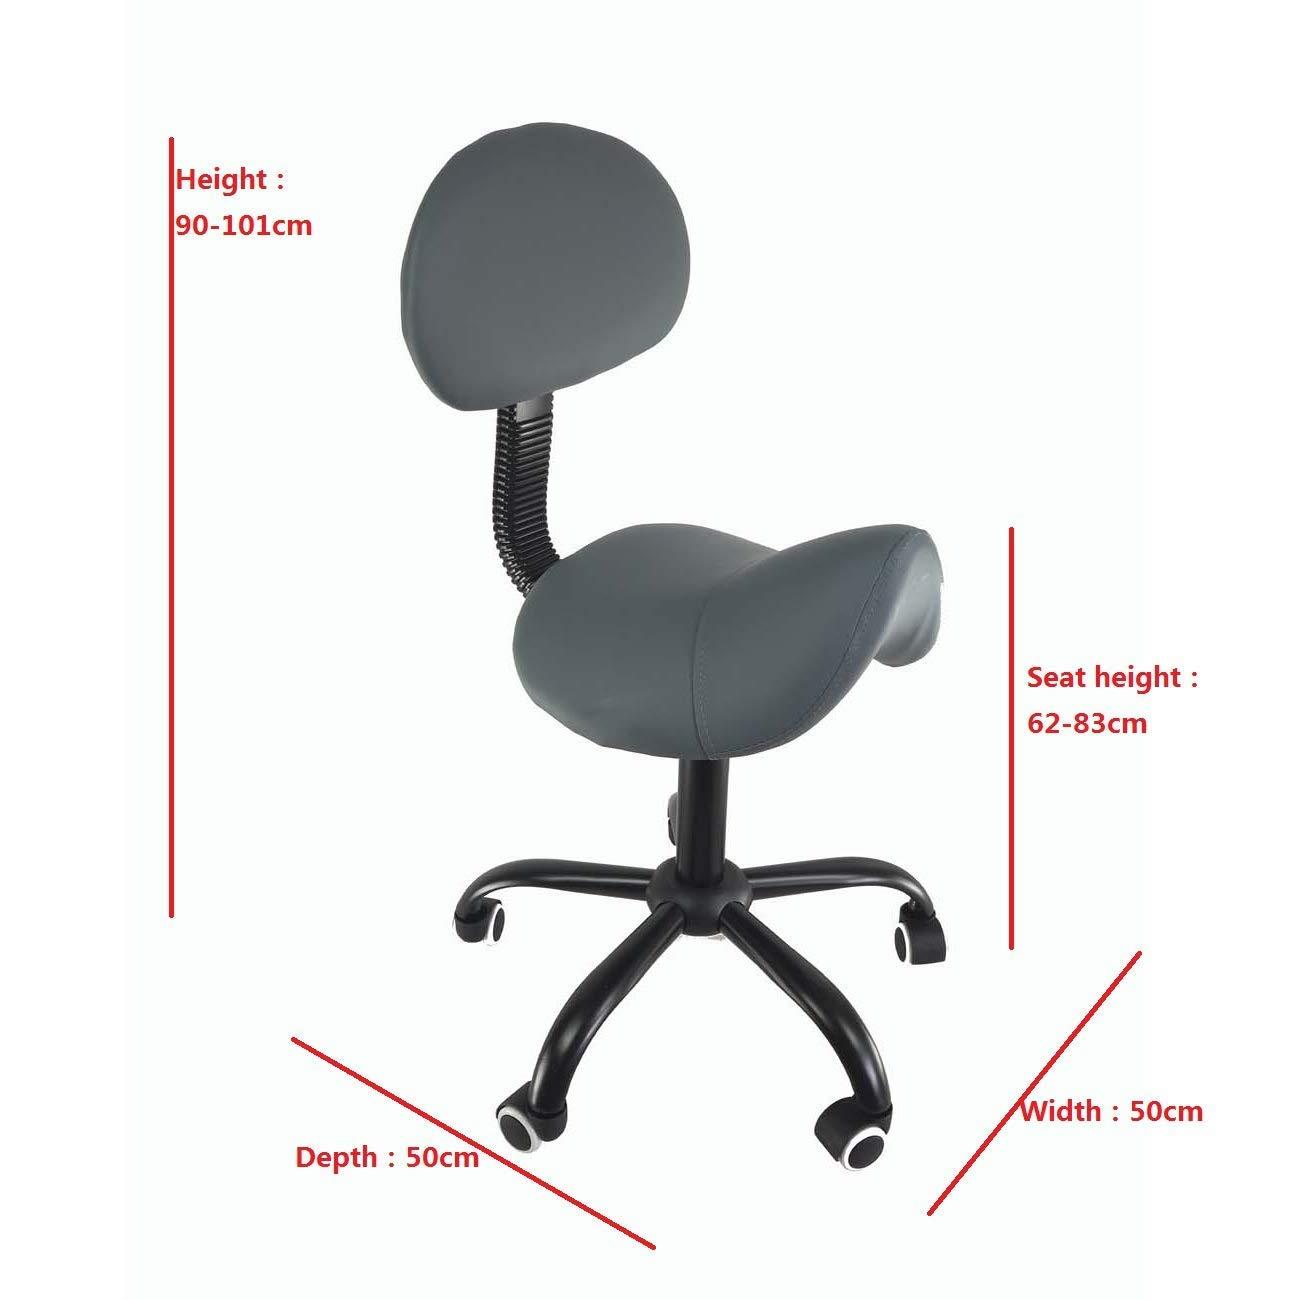 Tremendous Amazon Com Deed Home Chair Stool Folding Chair Saddle Salon Pabps2019 Chair Design Images Pabps2019Com